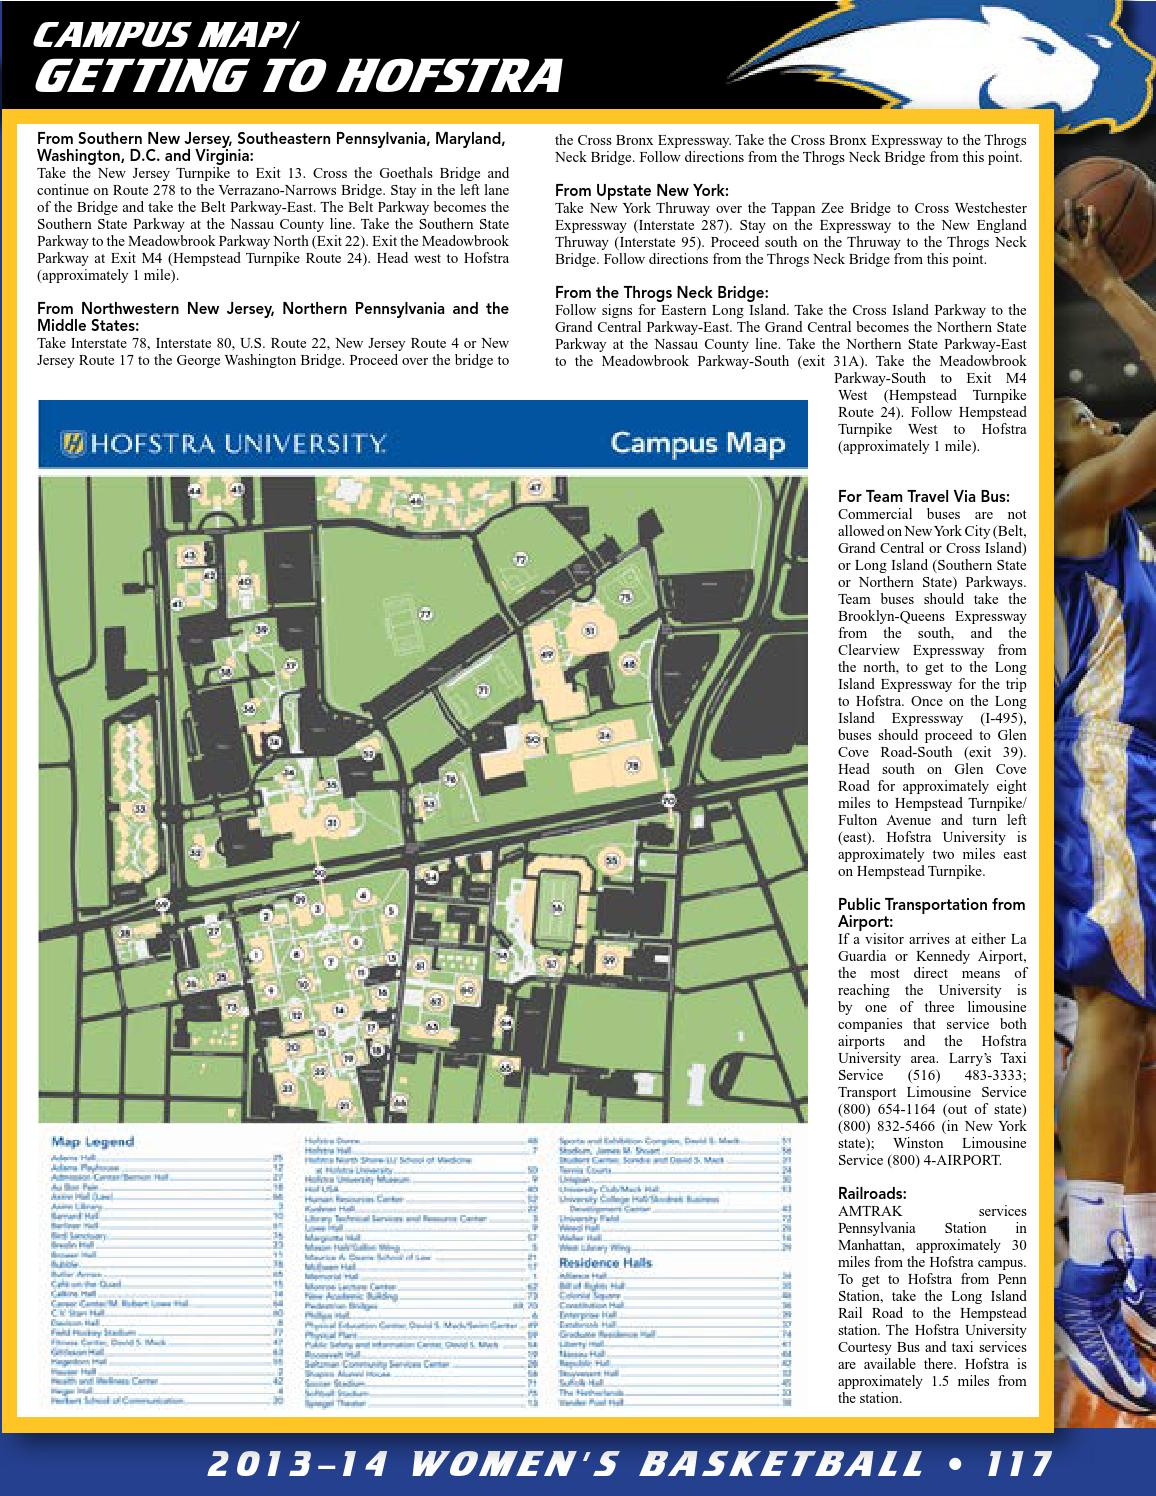 2013 14 Hofstra University Women S Basketball Guide By Hofstra